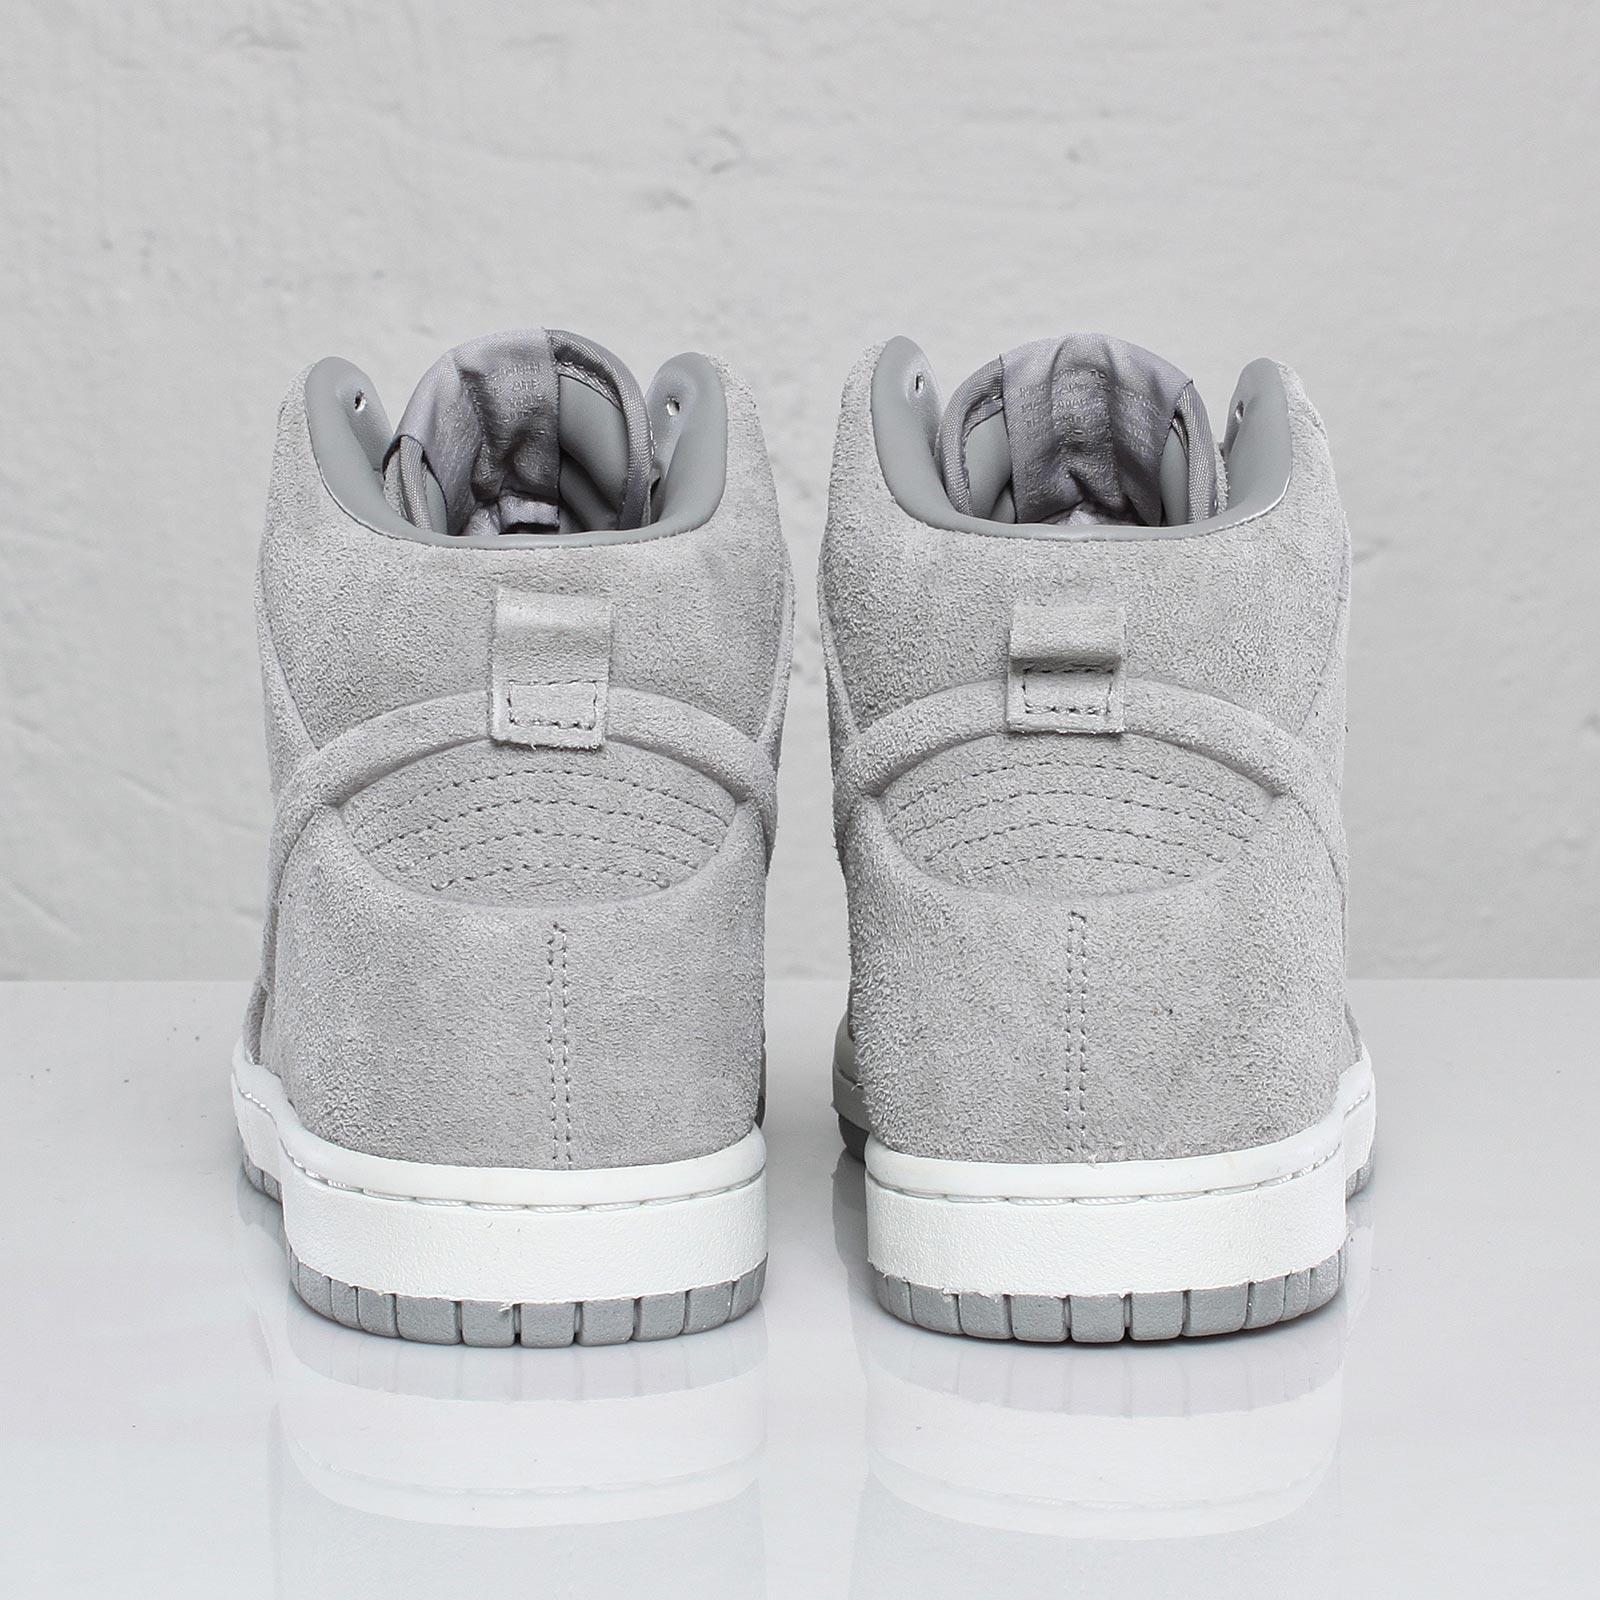 Nike Wmns Dunk High Skinny Prm - 102635 - Sneakersnstuff  a6a8e58f1